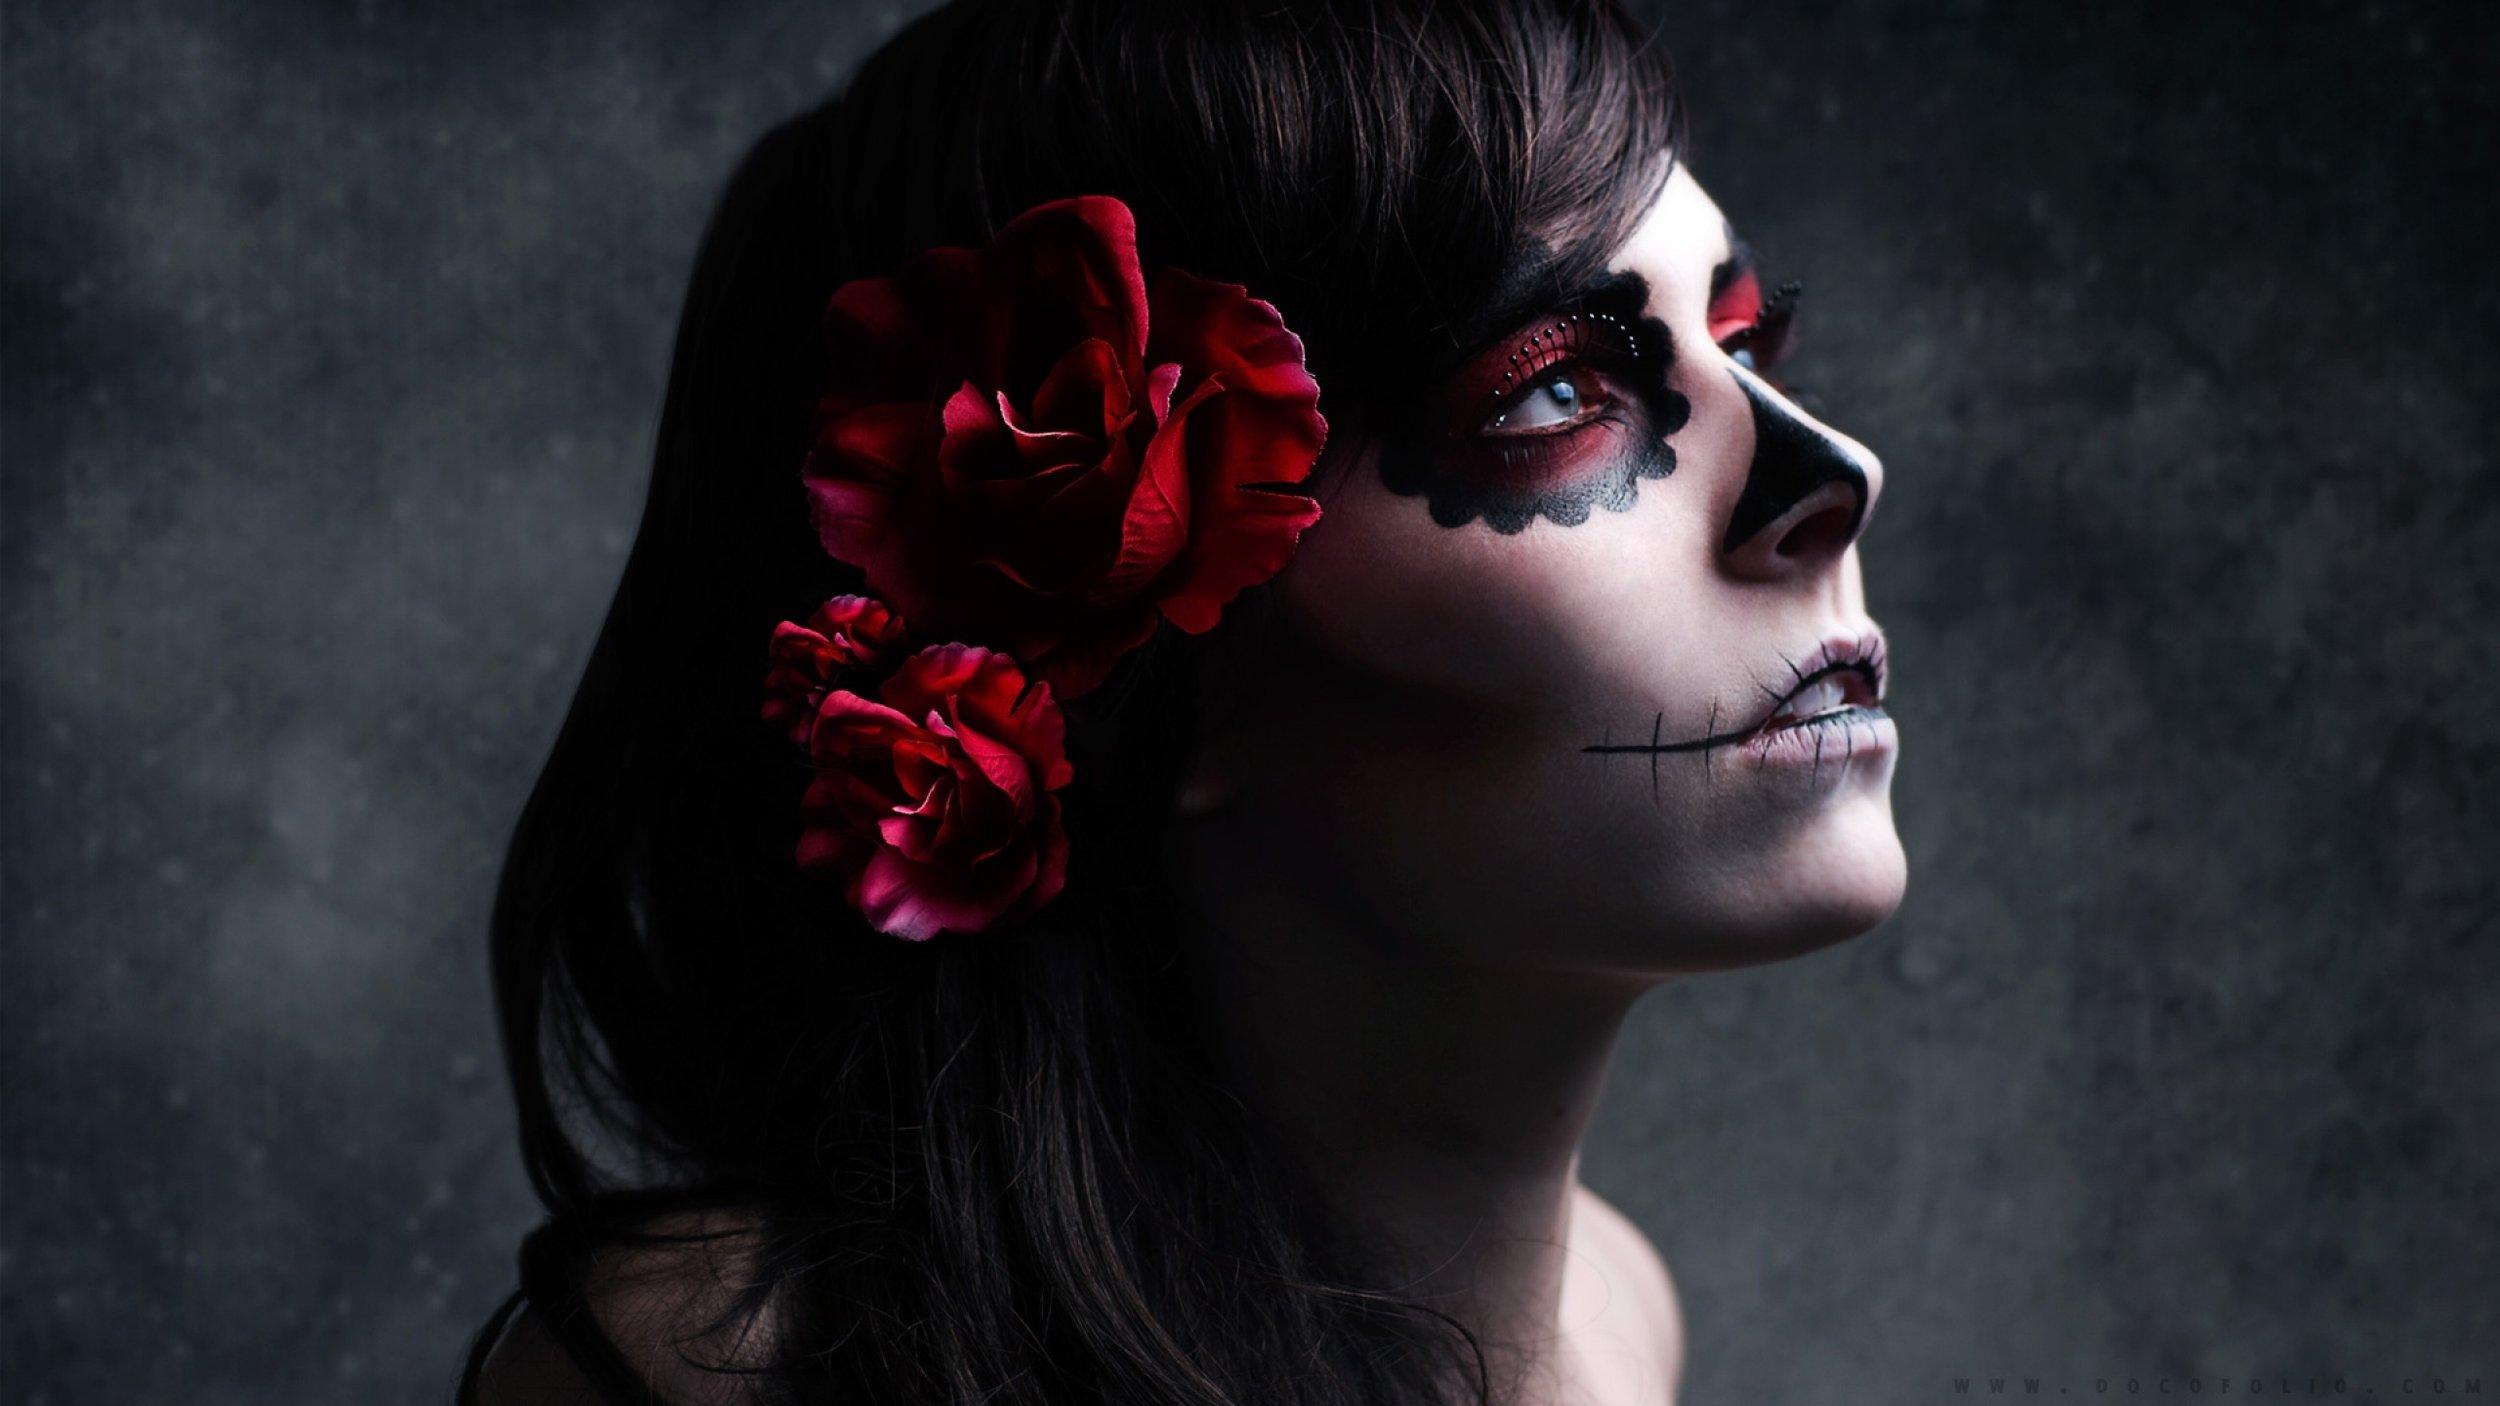 tattoos_women_makeup_faces_kelsey_harker_sugar_skulls_1920x1080_wallpaper_high-resolution-wallpaper_2560x1440_www-wallpaperhi-com.jpg